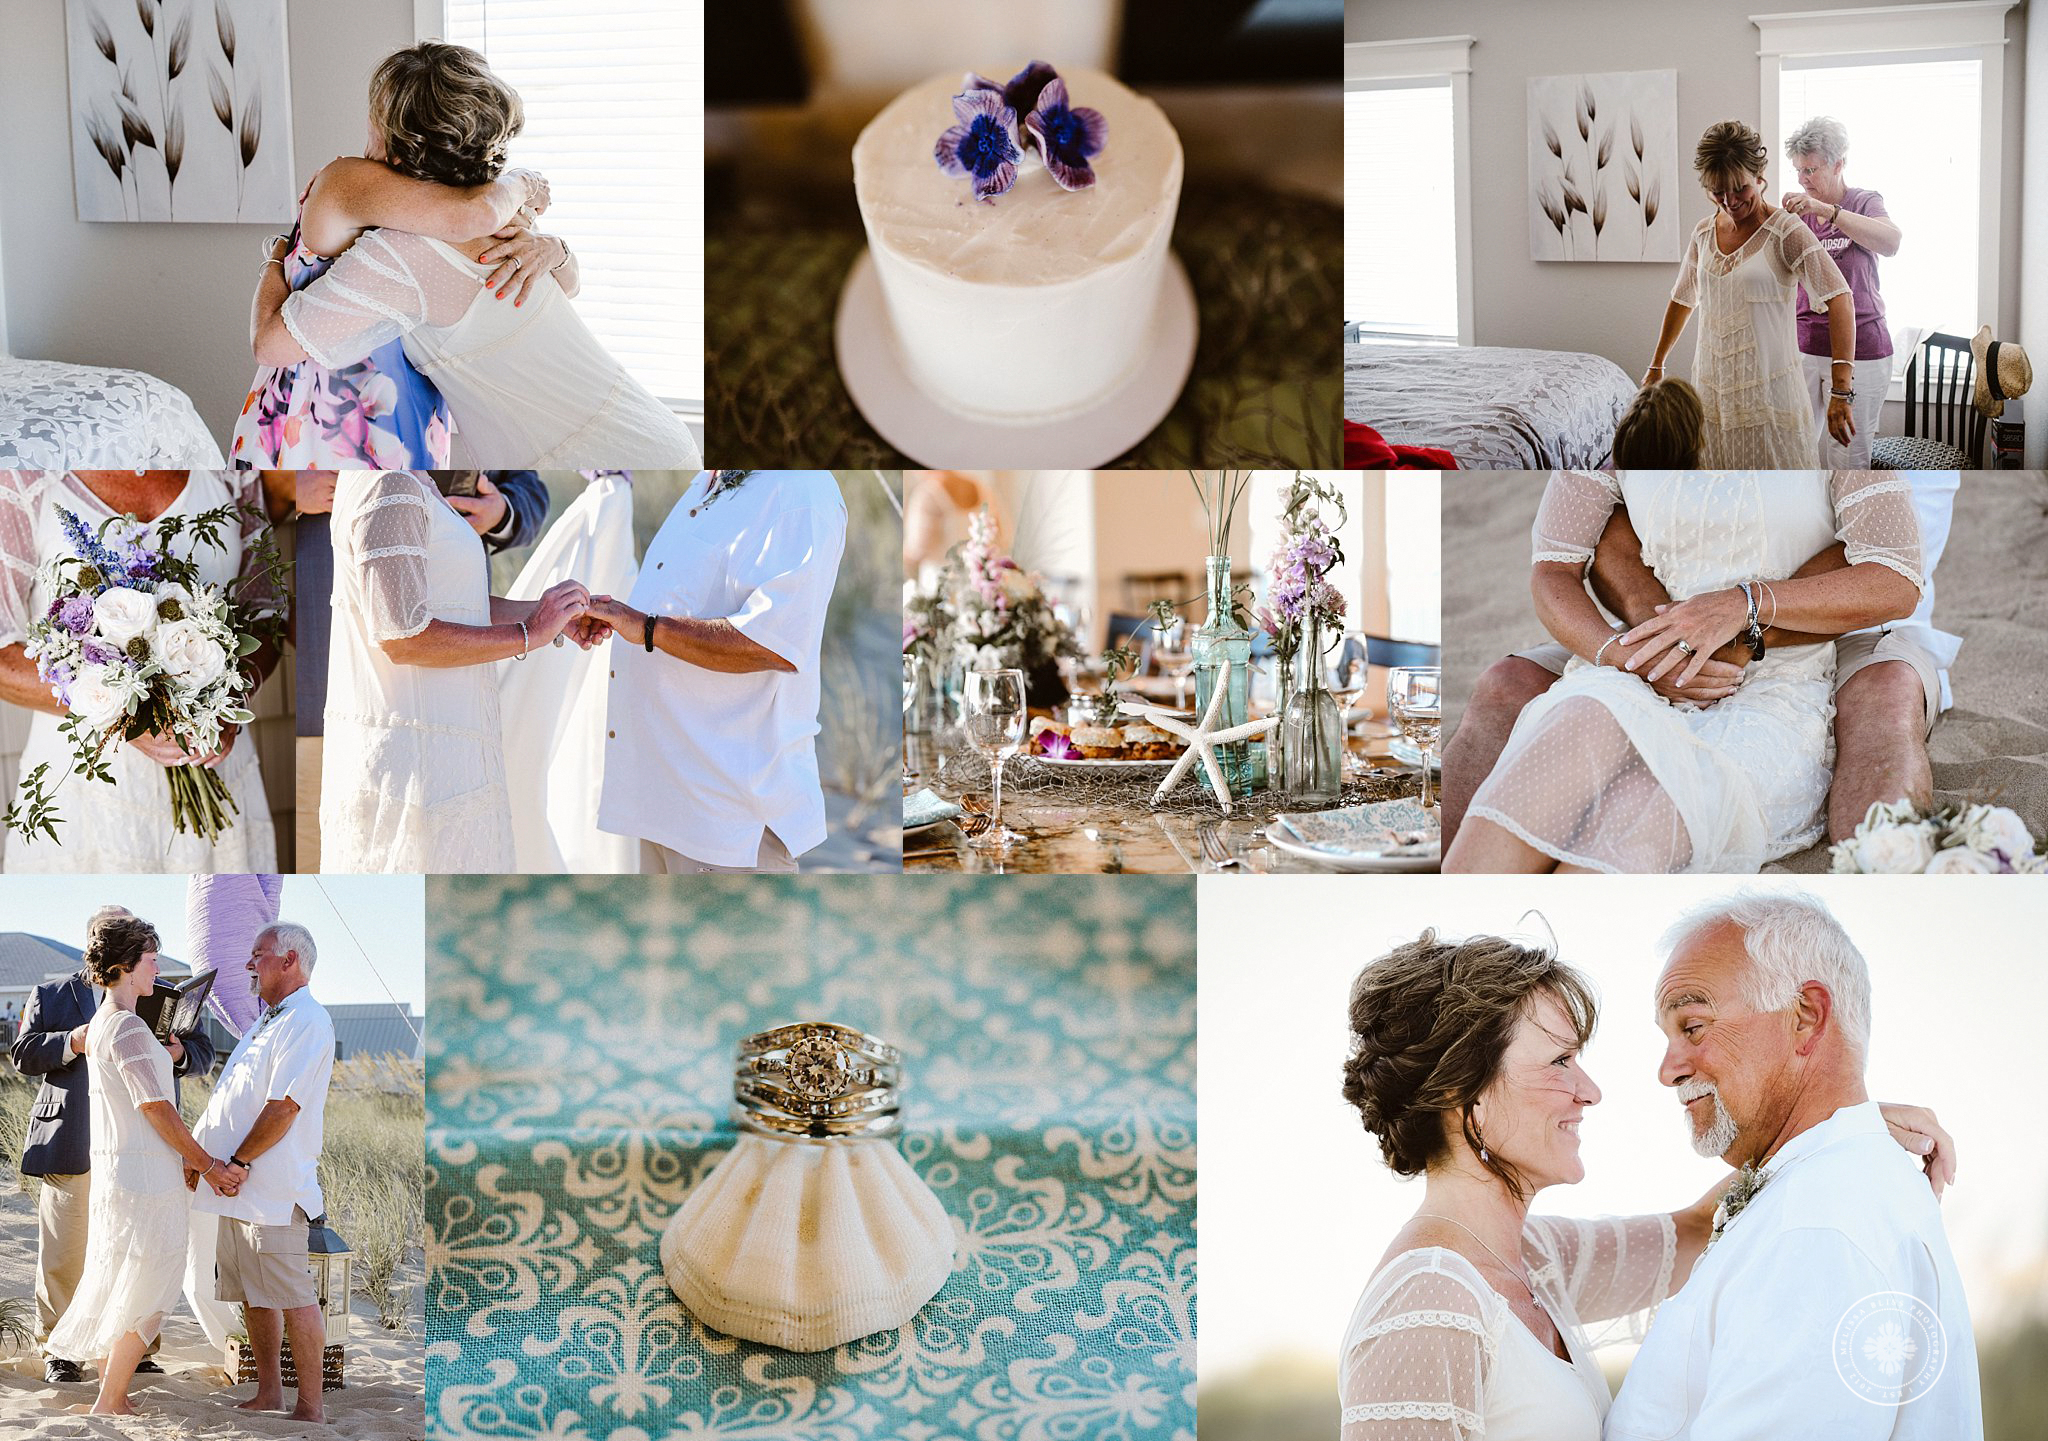 sandbridge-beach-wedding-photographer-melissa-bliss-photography-beach-cottage-wedding-details-wedding-photographers-virginia.jpg